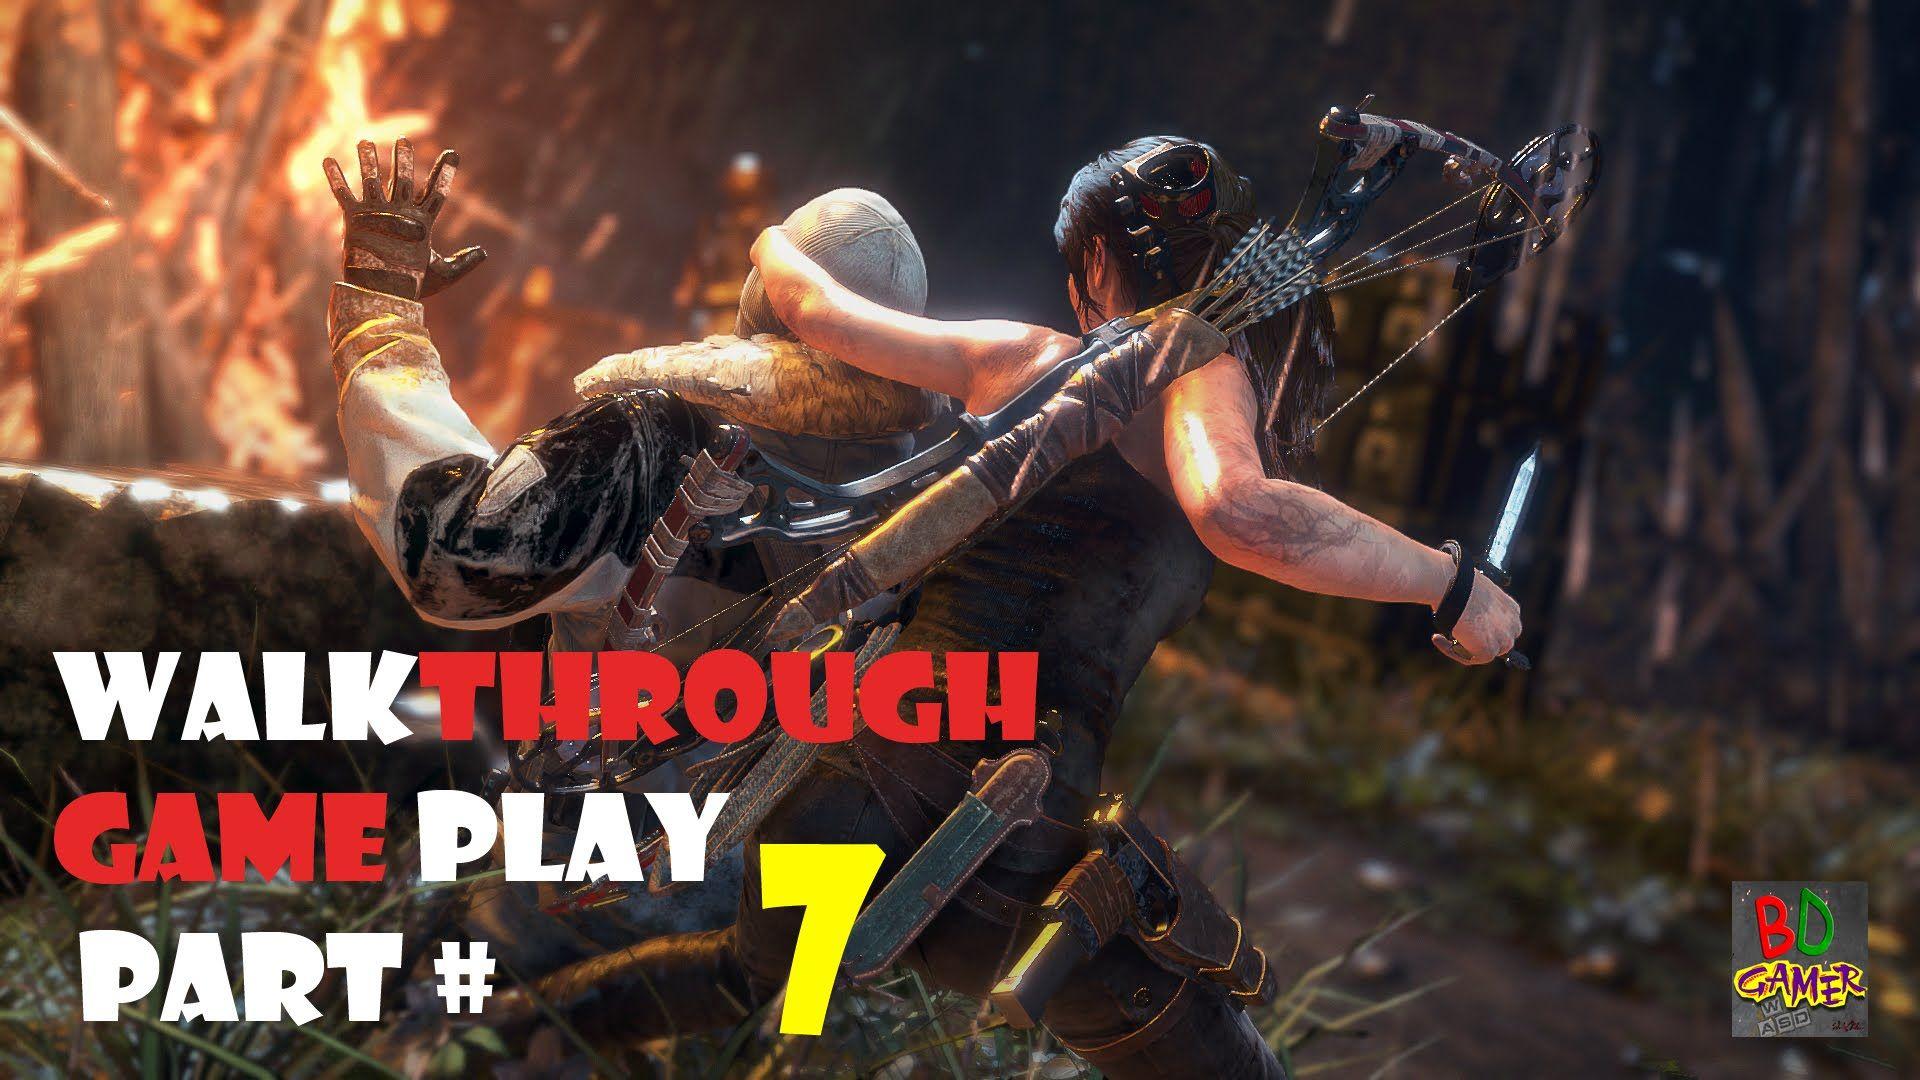 BD Gamer- Rise of the Tomb Raider Walkthrough Gameplay - Part 7